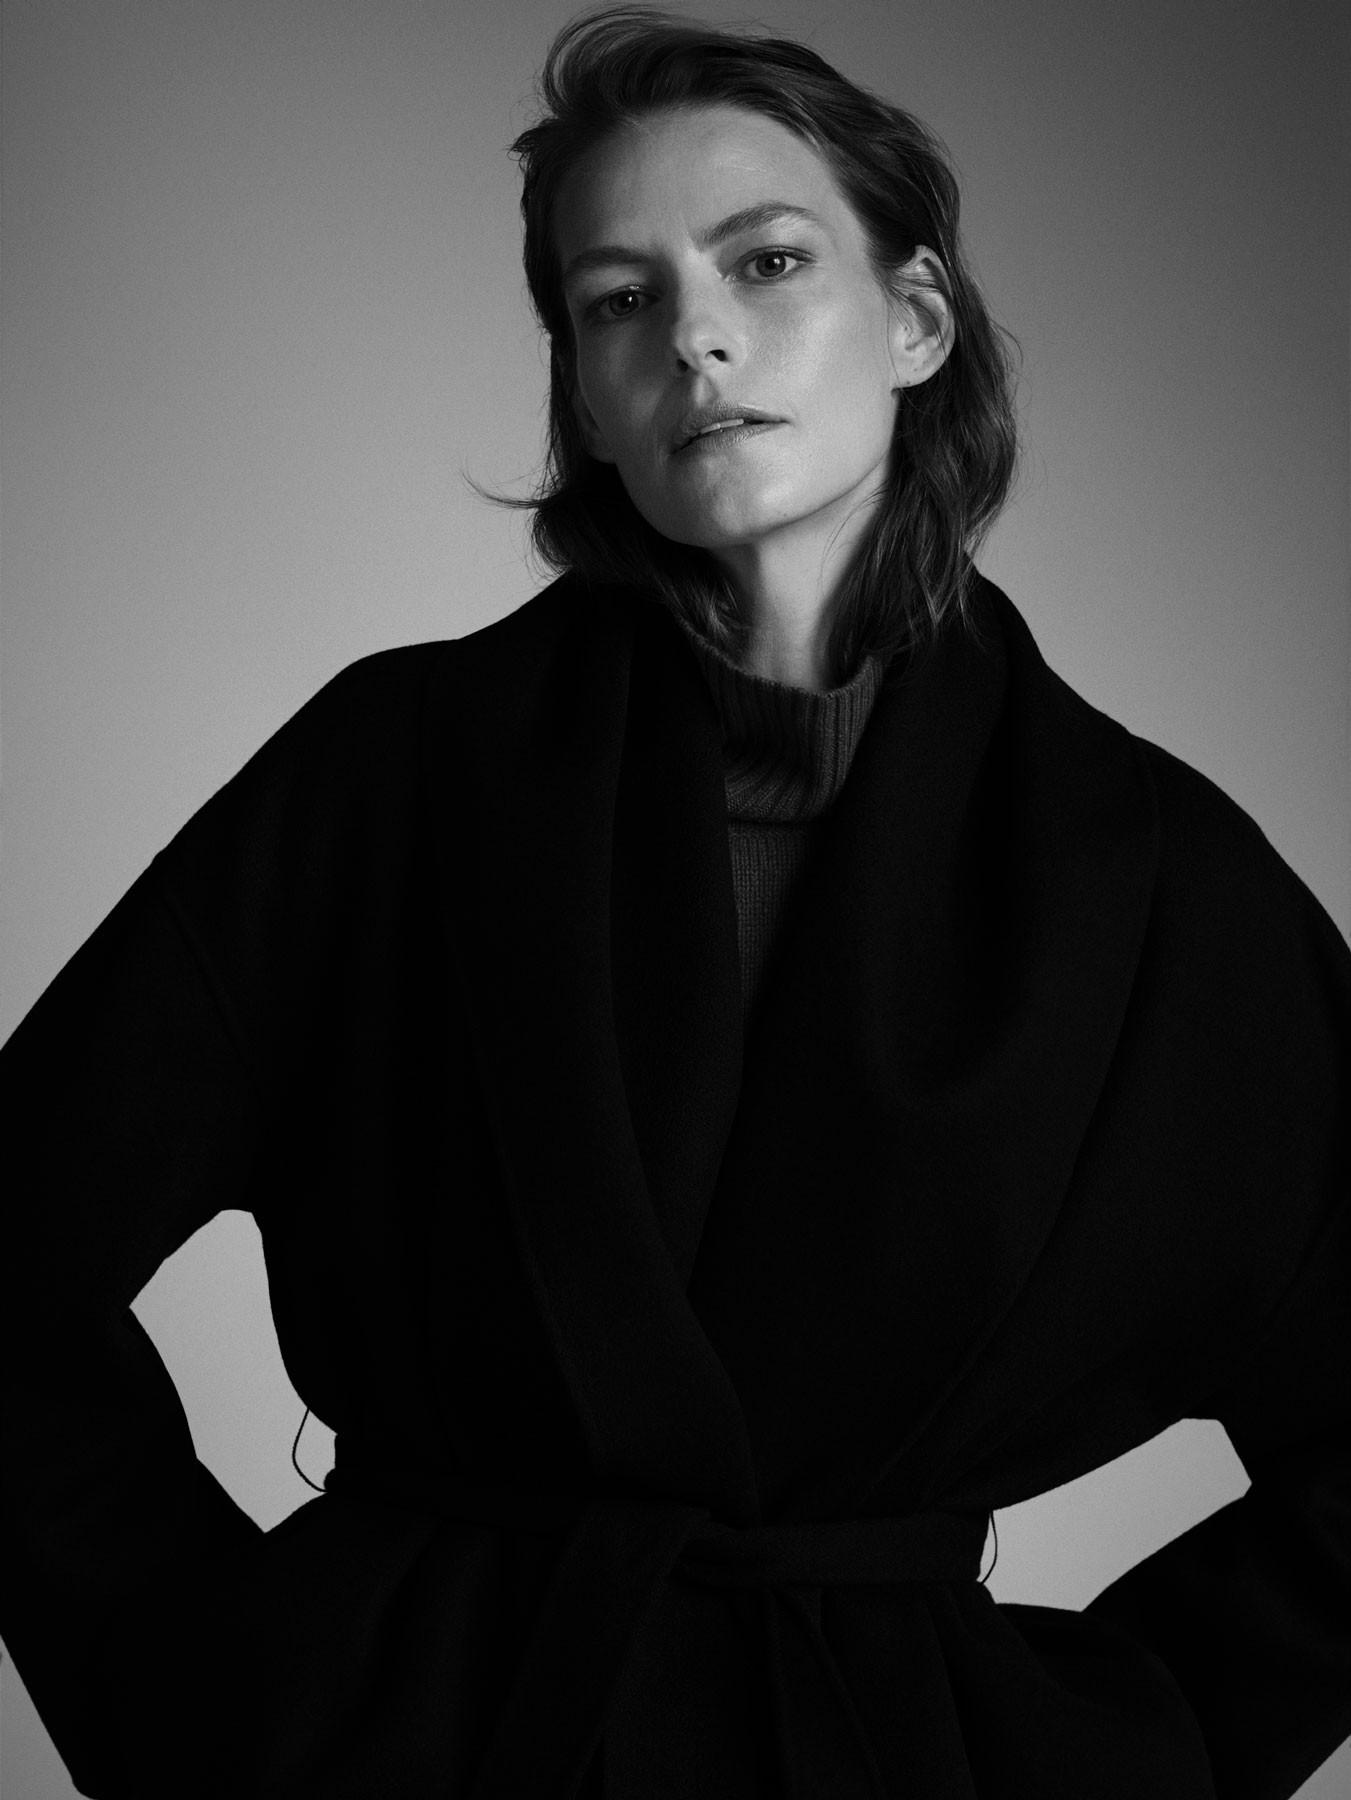 Viktorija Lala Serrano